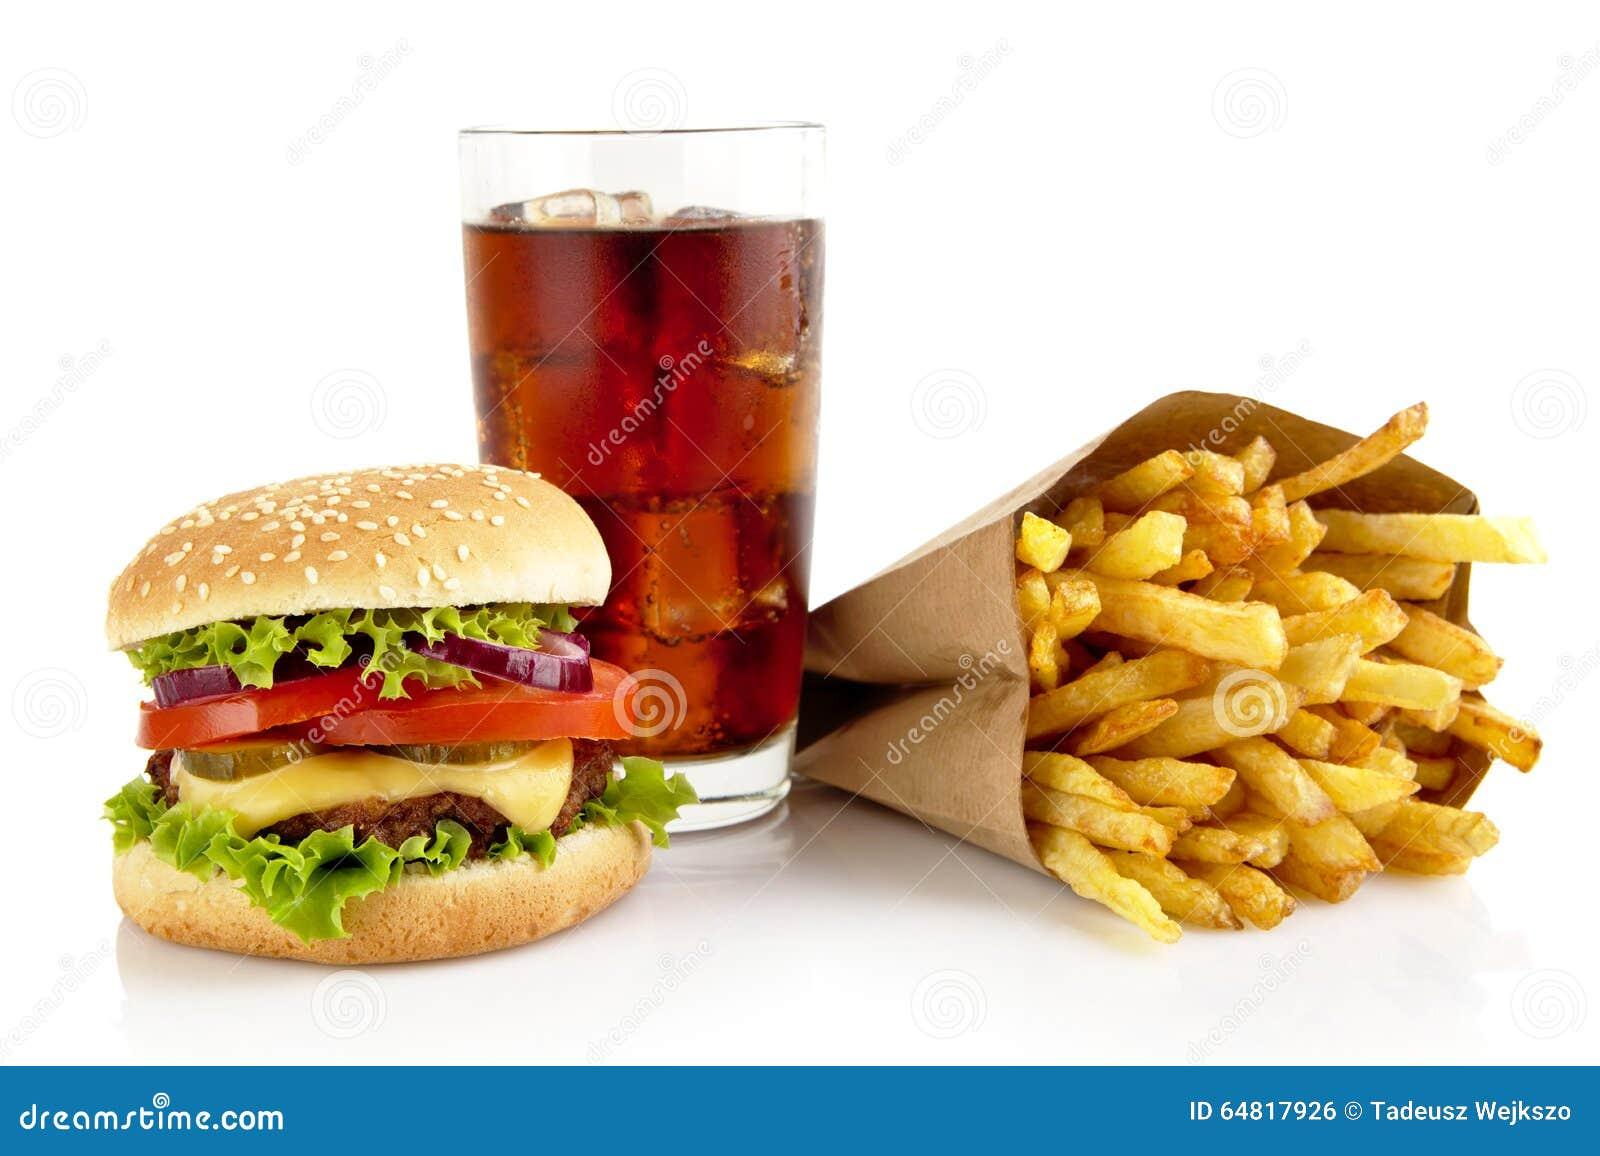 meet fries singles Simplot sweets® sweet potato fries crinkle cut 1/2 6/25lb  sweets meet consumer's desire for healthier menu  arrange fries in a single layer on sheet pans.